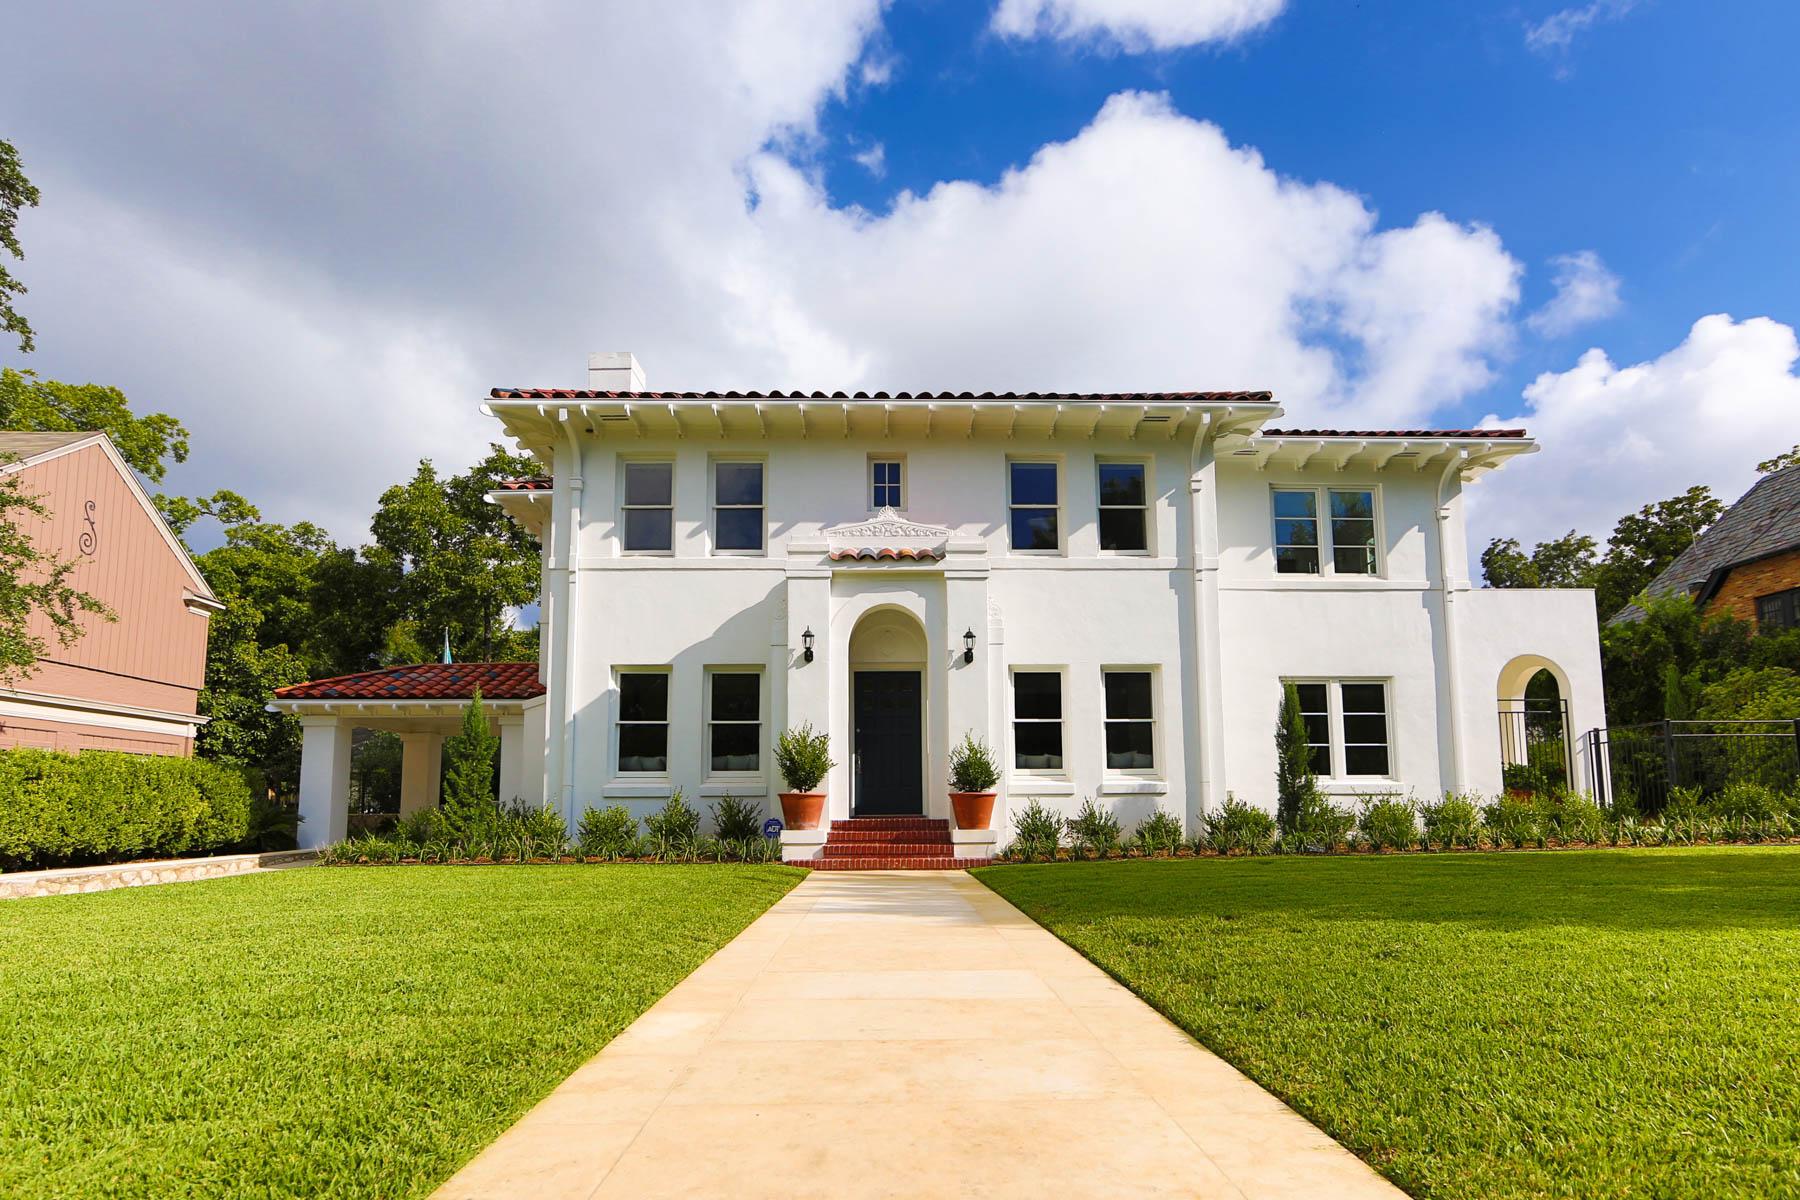 Single Family Home for Sale at Mediterranean Style Home in Monte Vista 117 W Gramercy Pl San Antonio, Texas 78212 United States